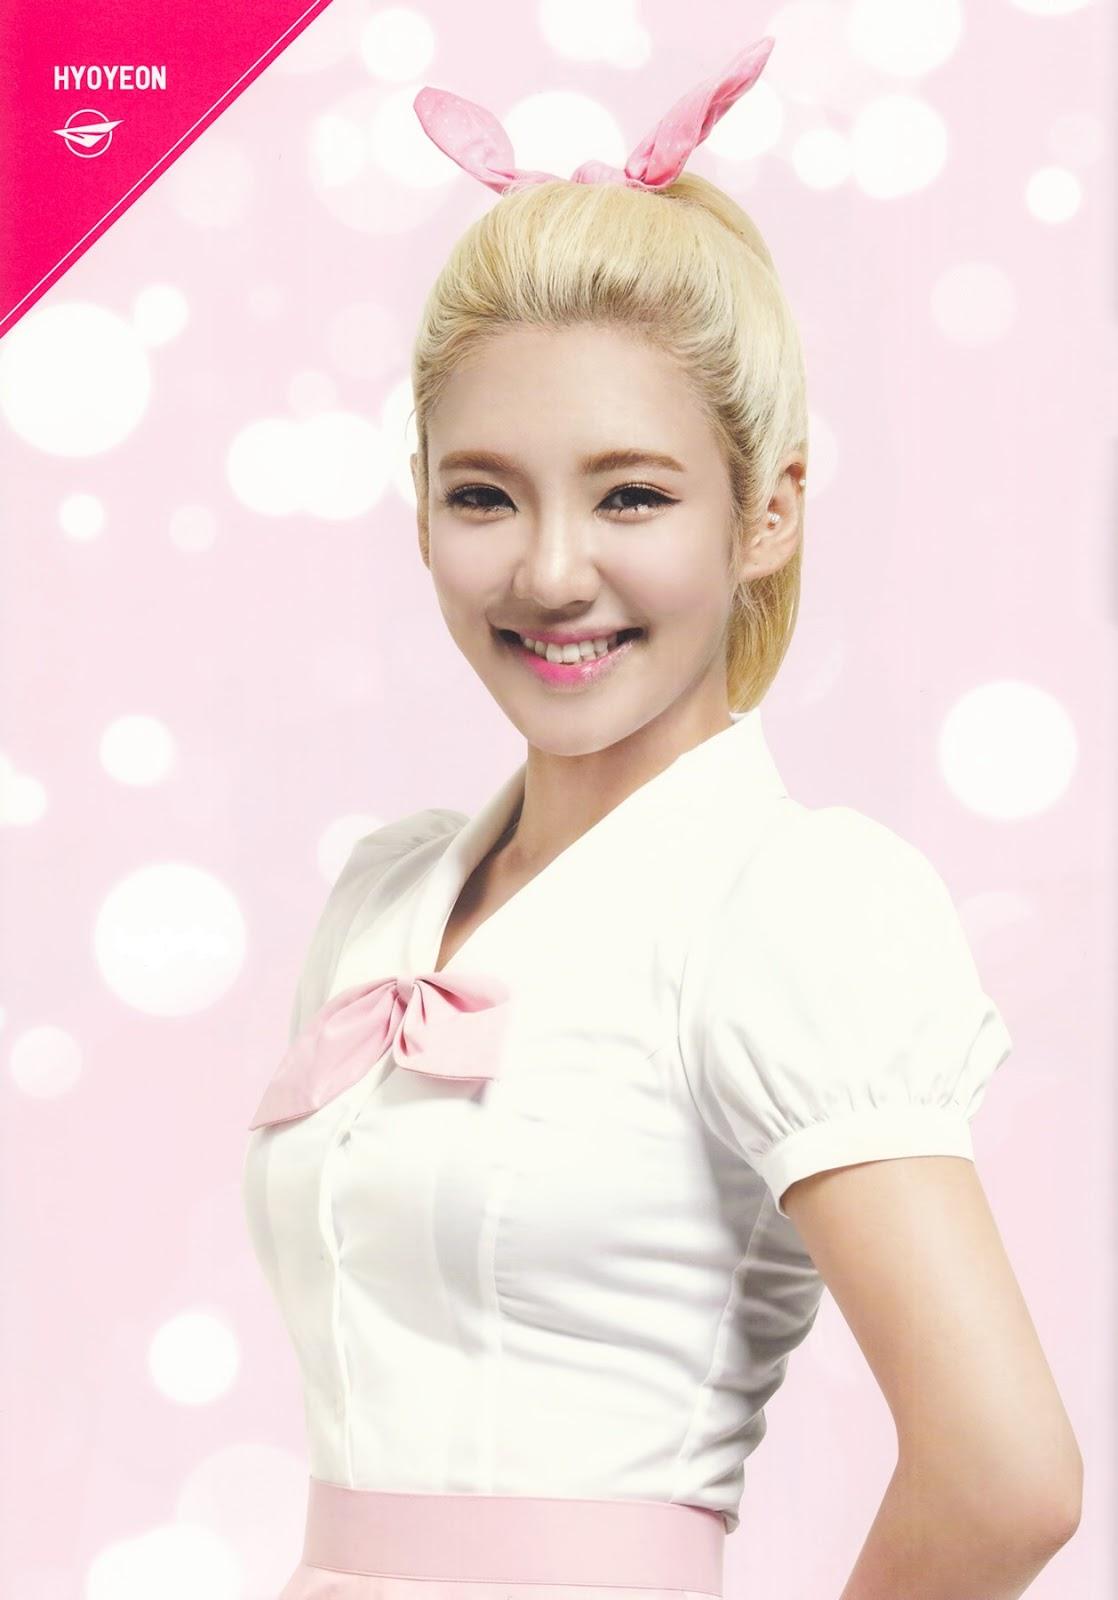 Girls' Generation Hyoyeon